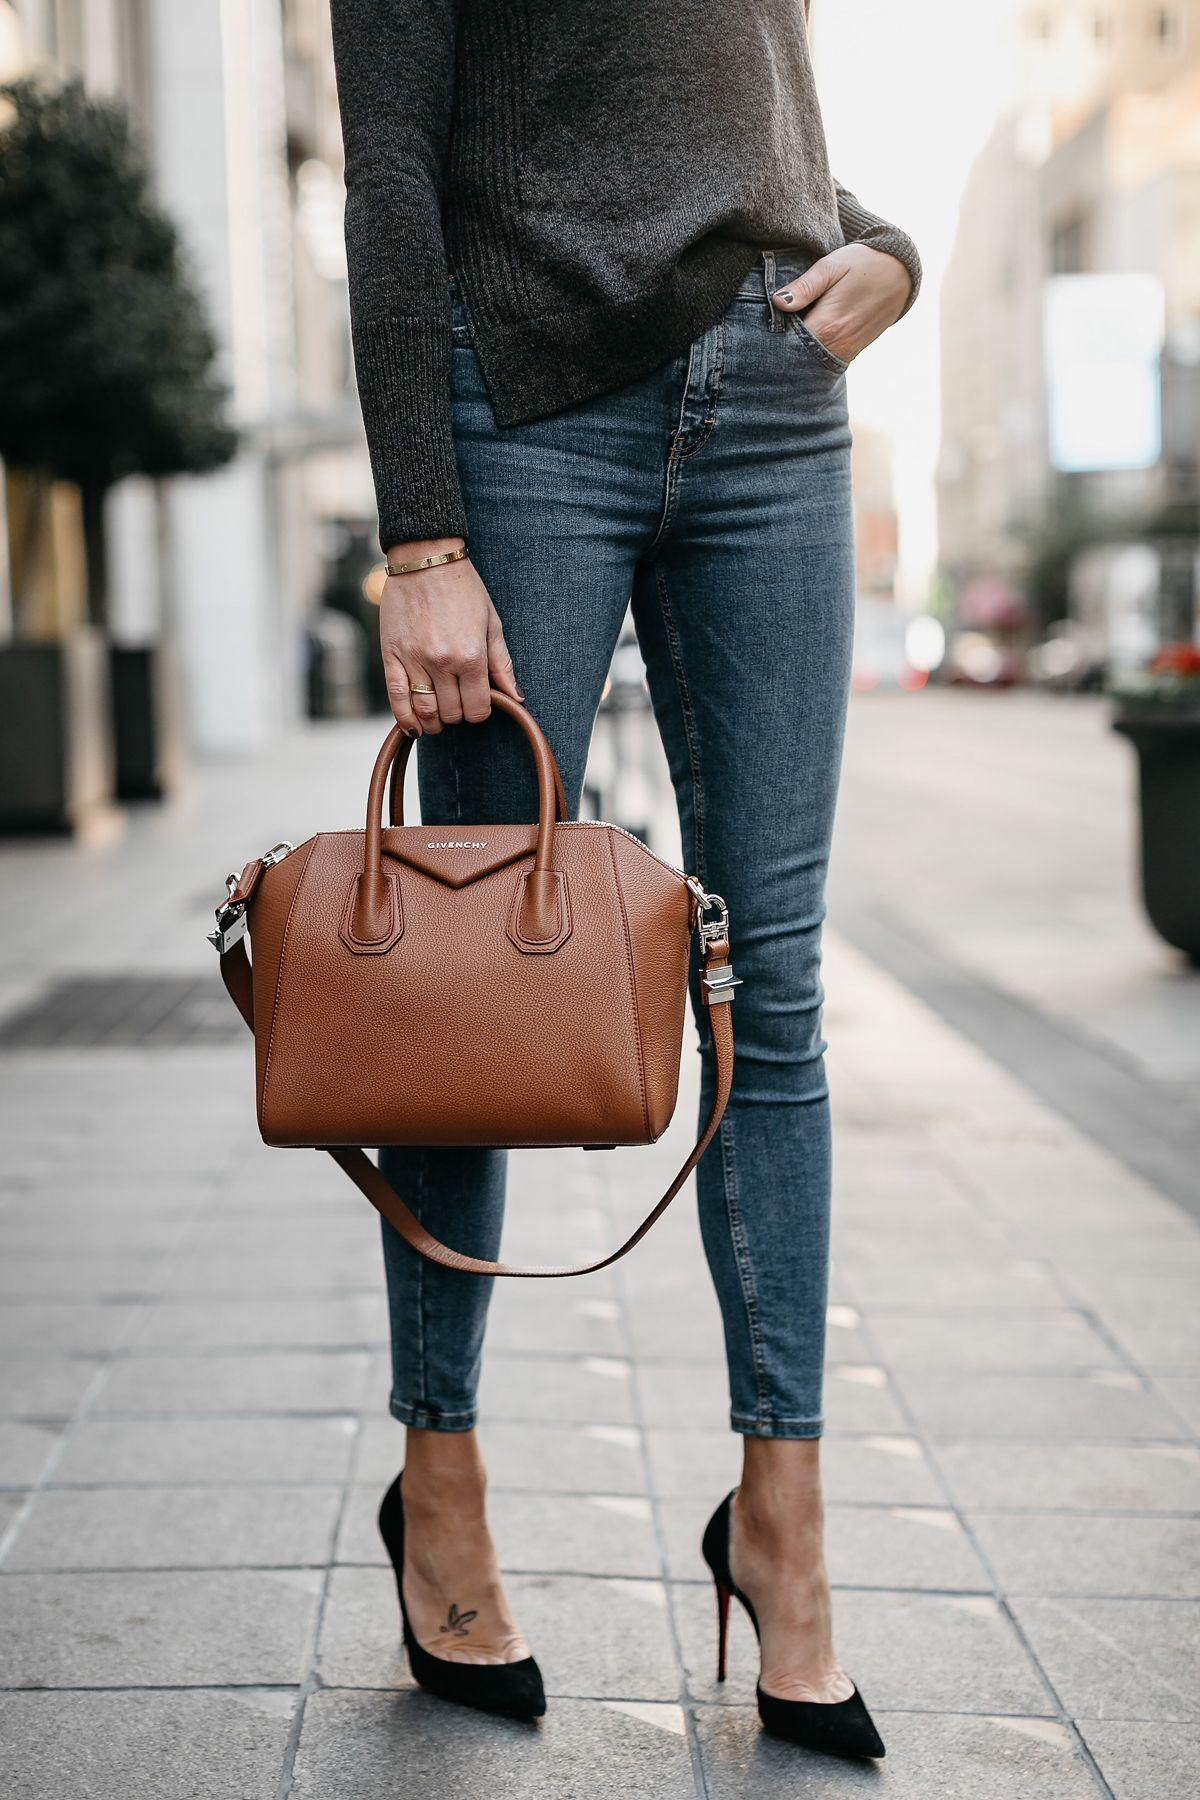 e356c3949447 Grey Sweater Denim Skinny Jeans Givenchy Antigona Cognac Handbag Black  Pumps Fashion Jackson Dallas Blogger Fashion Blogger Street Style